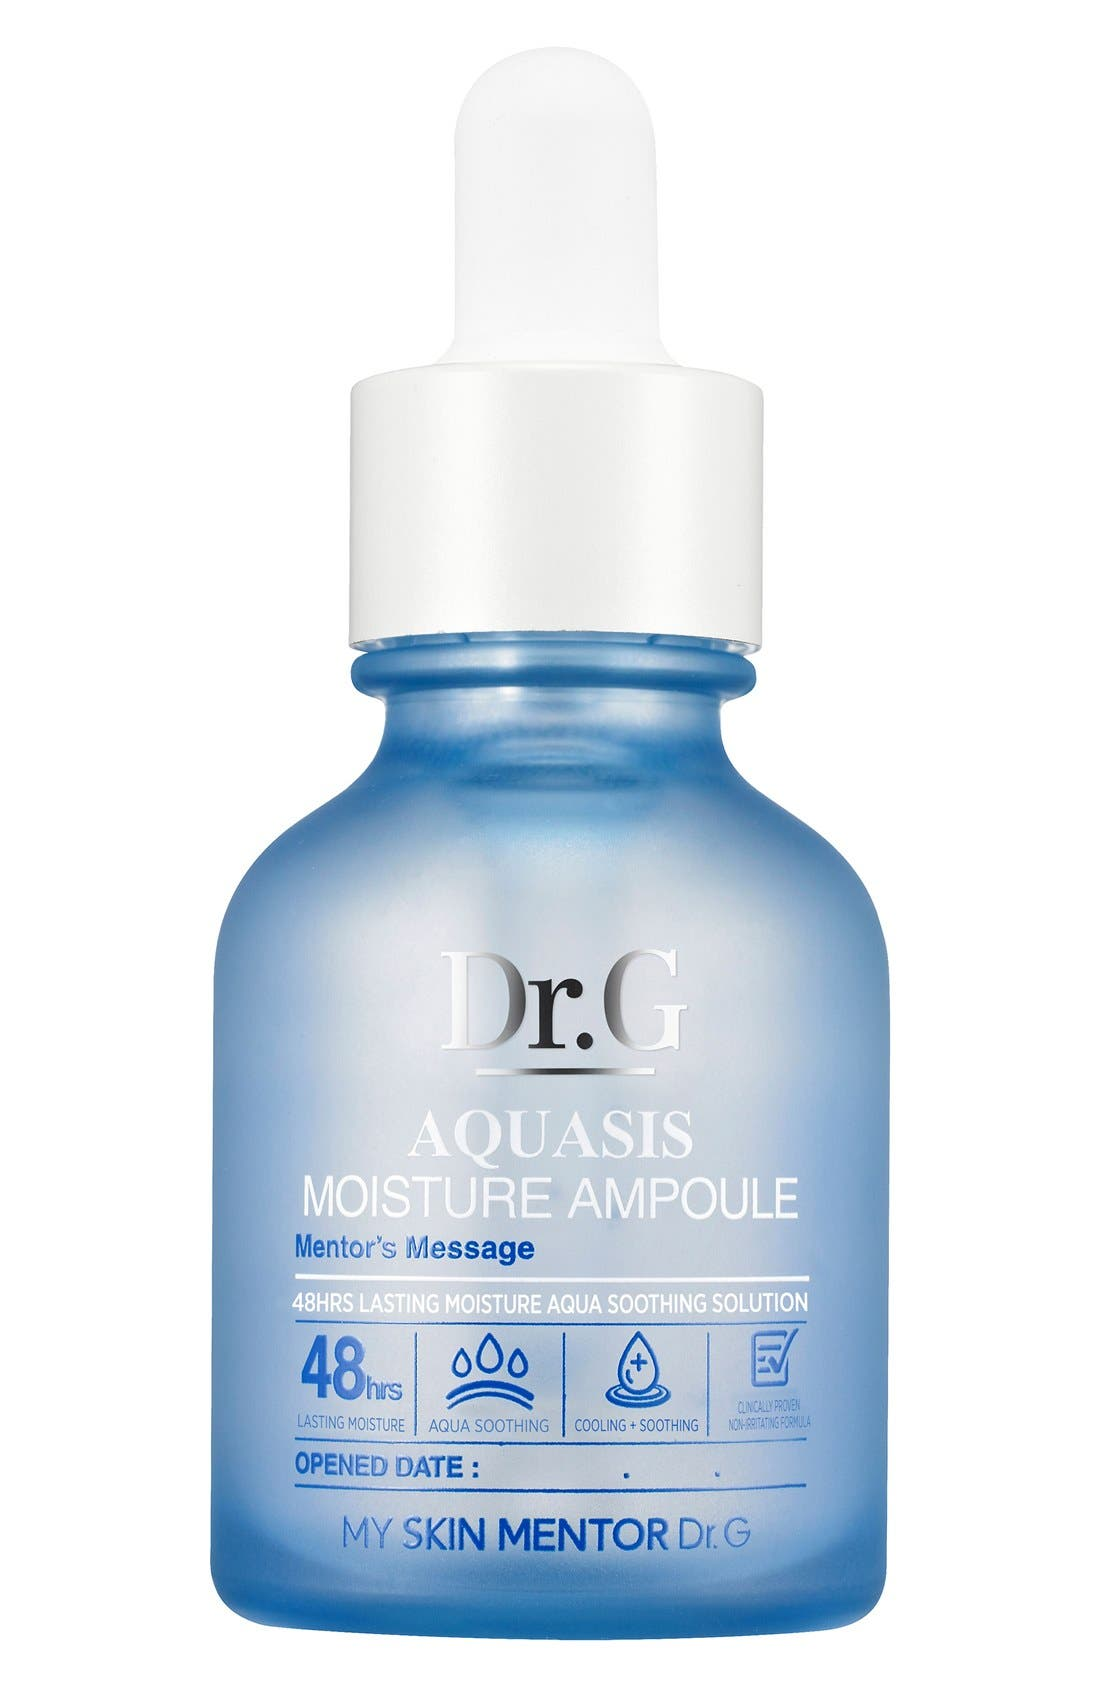 My Skin Mentor Dr. G Beauty Aquasis Moisture Ampoule